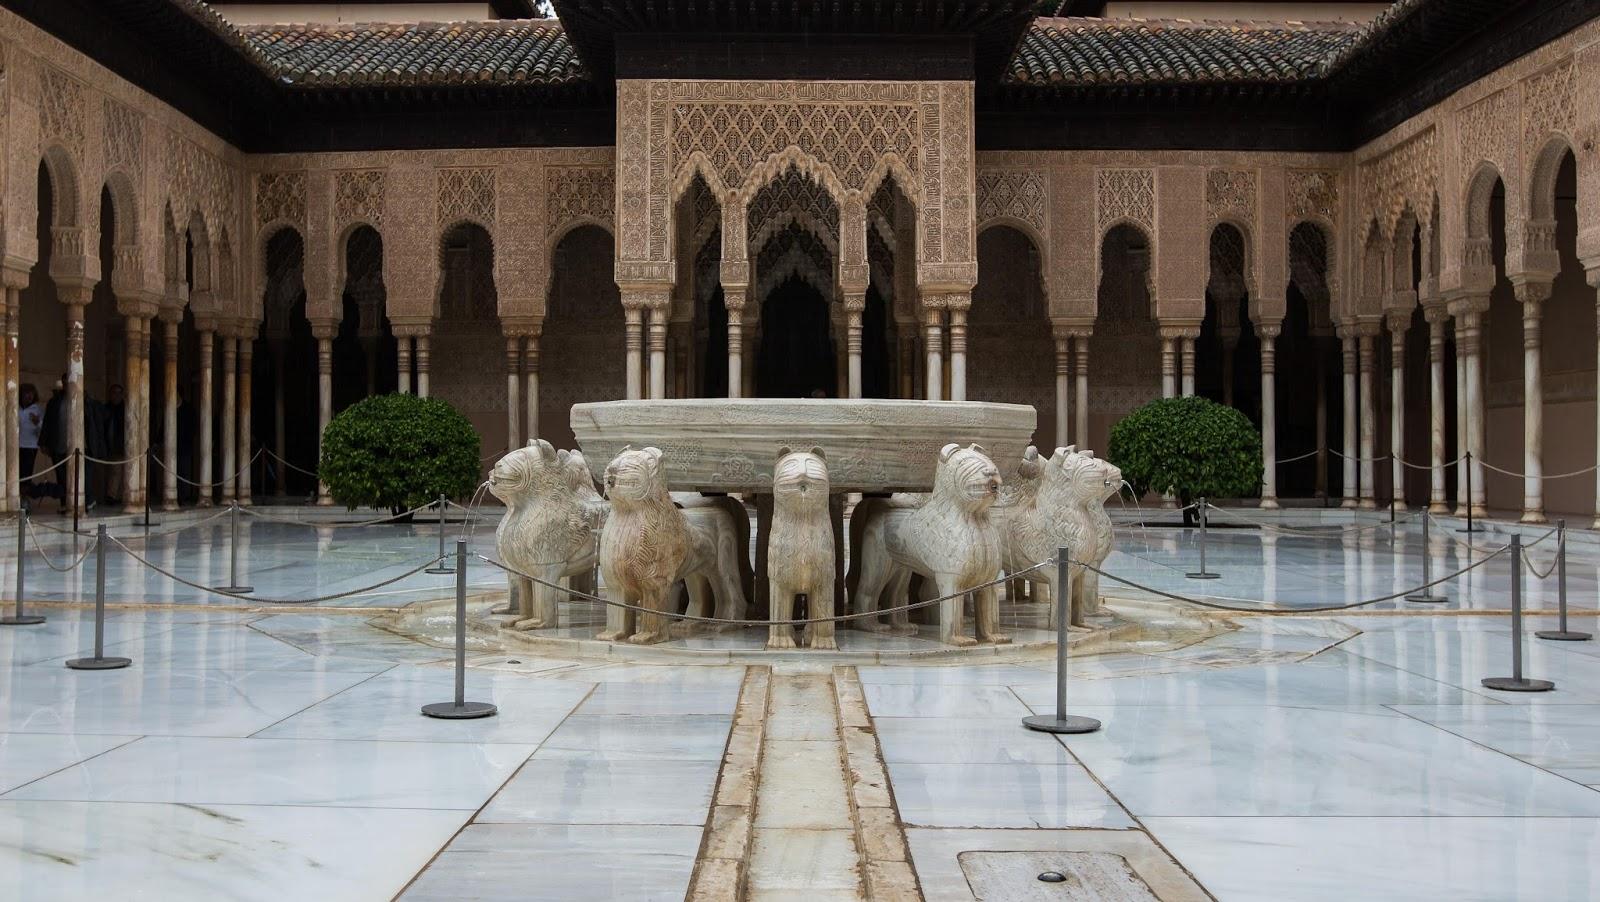 Patio de los leones de la mezquita de Córdoba.